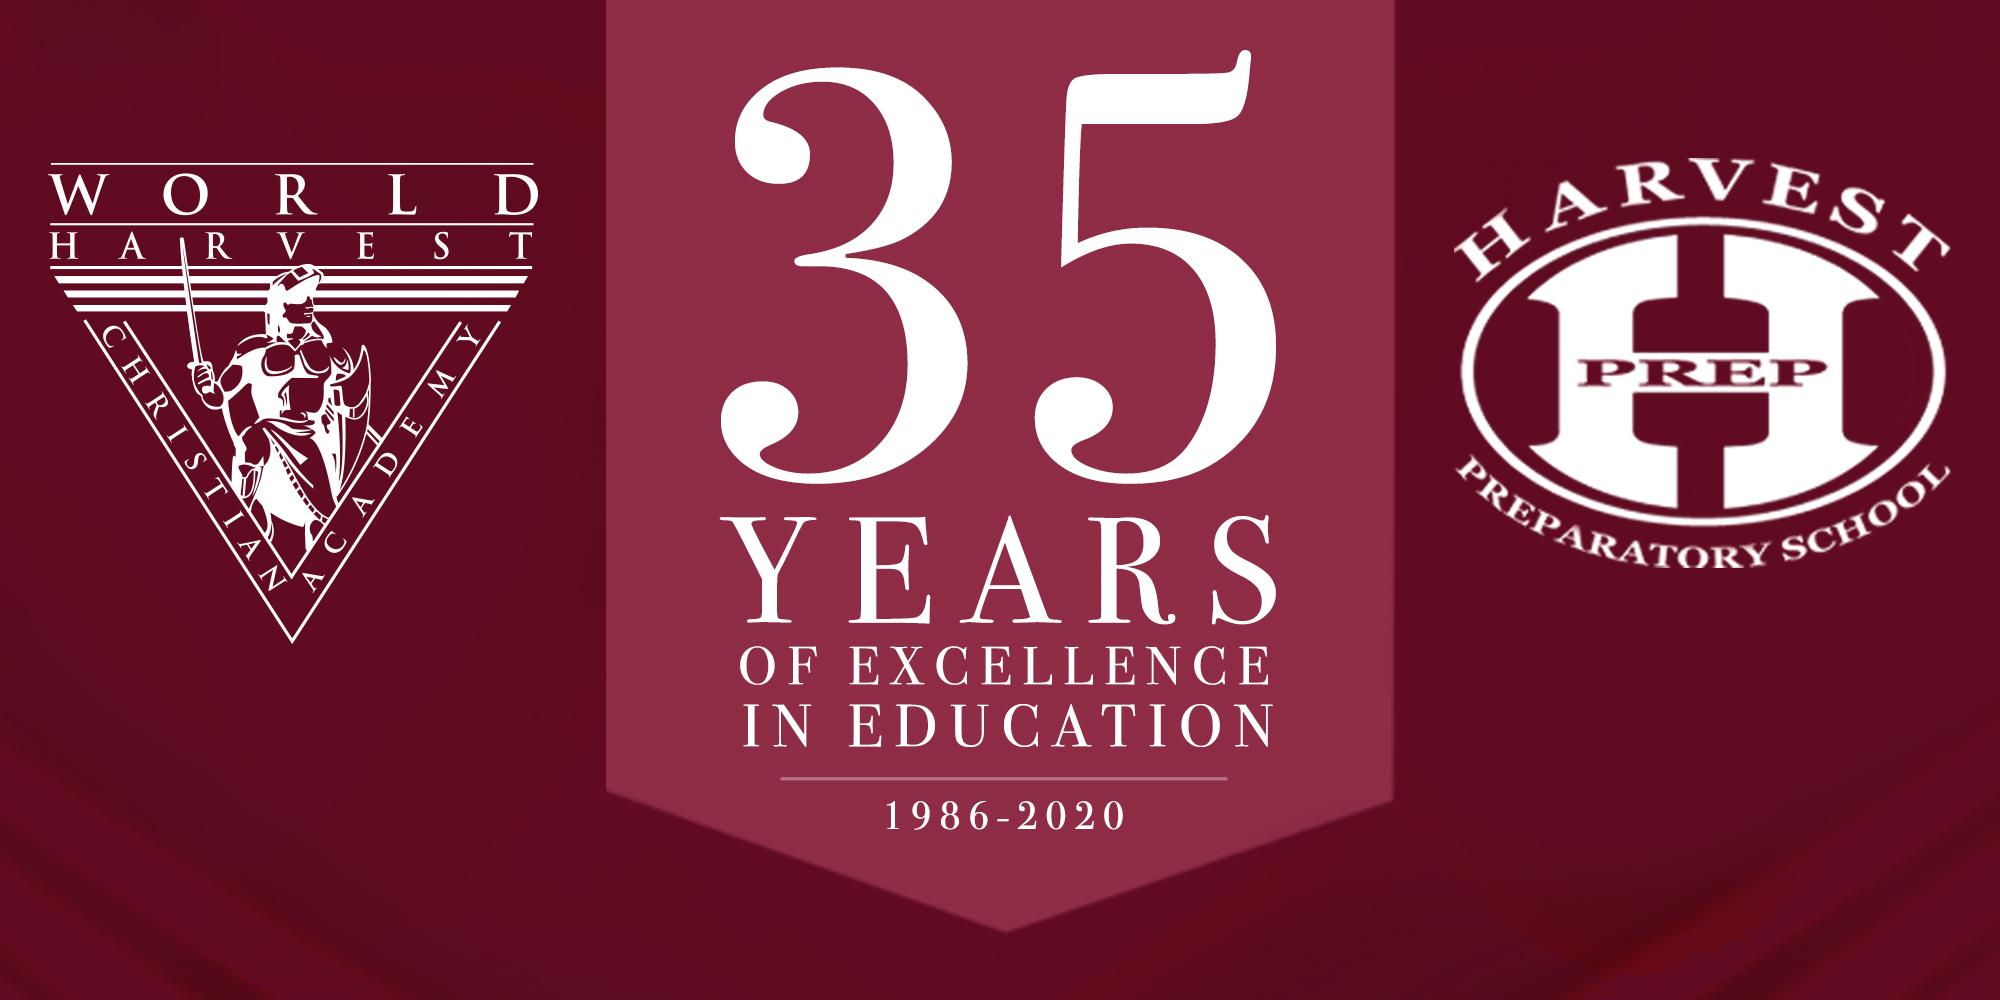 HPS 35th Anniversary